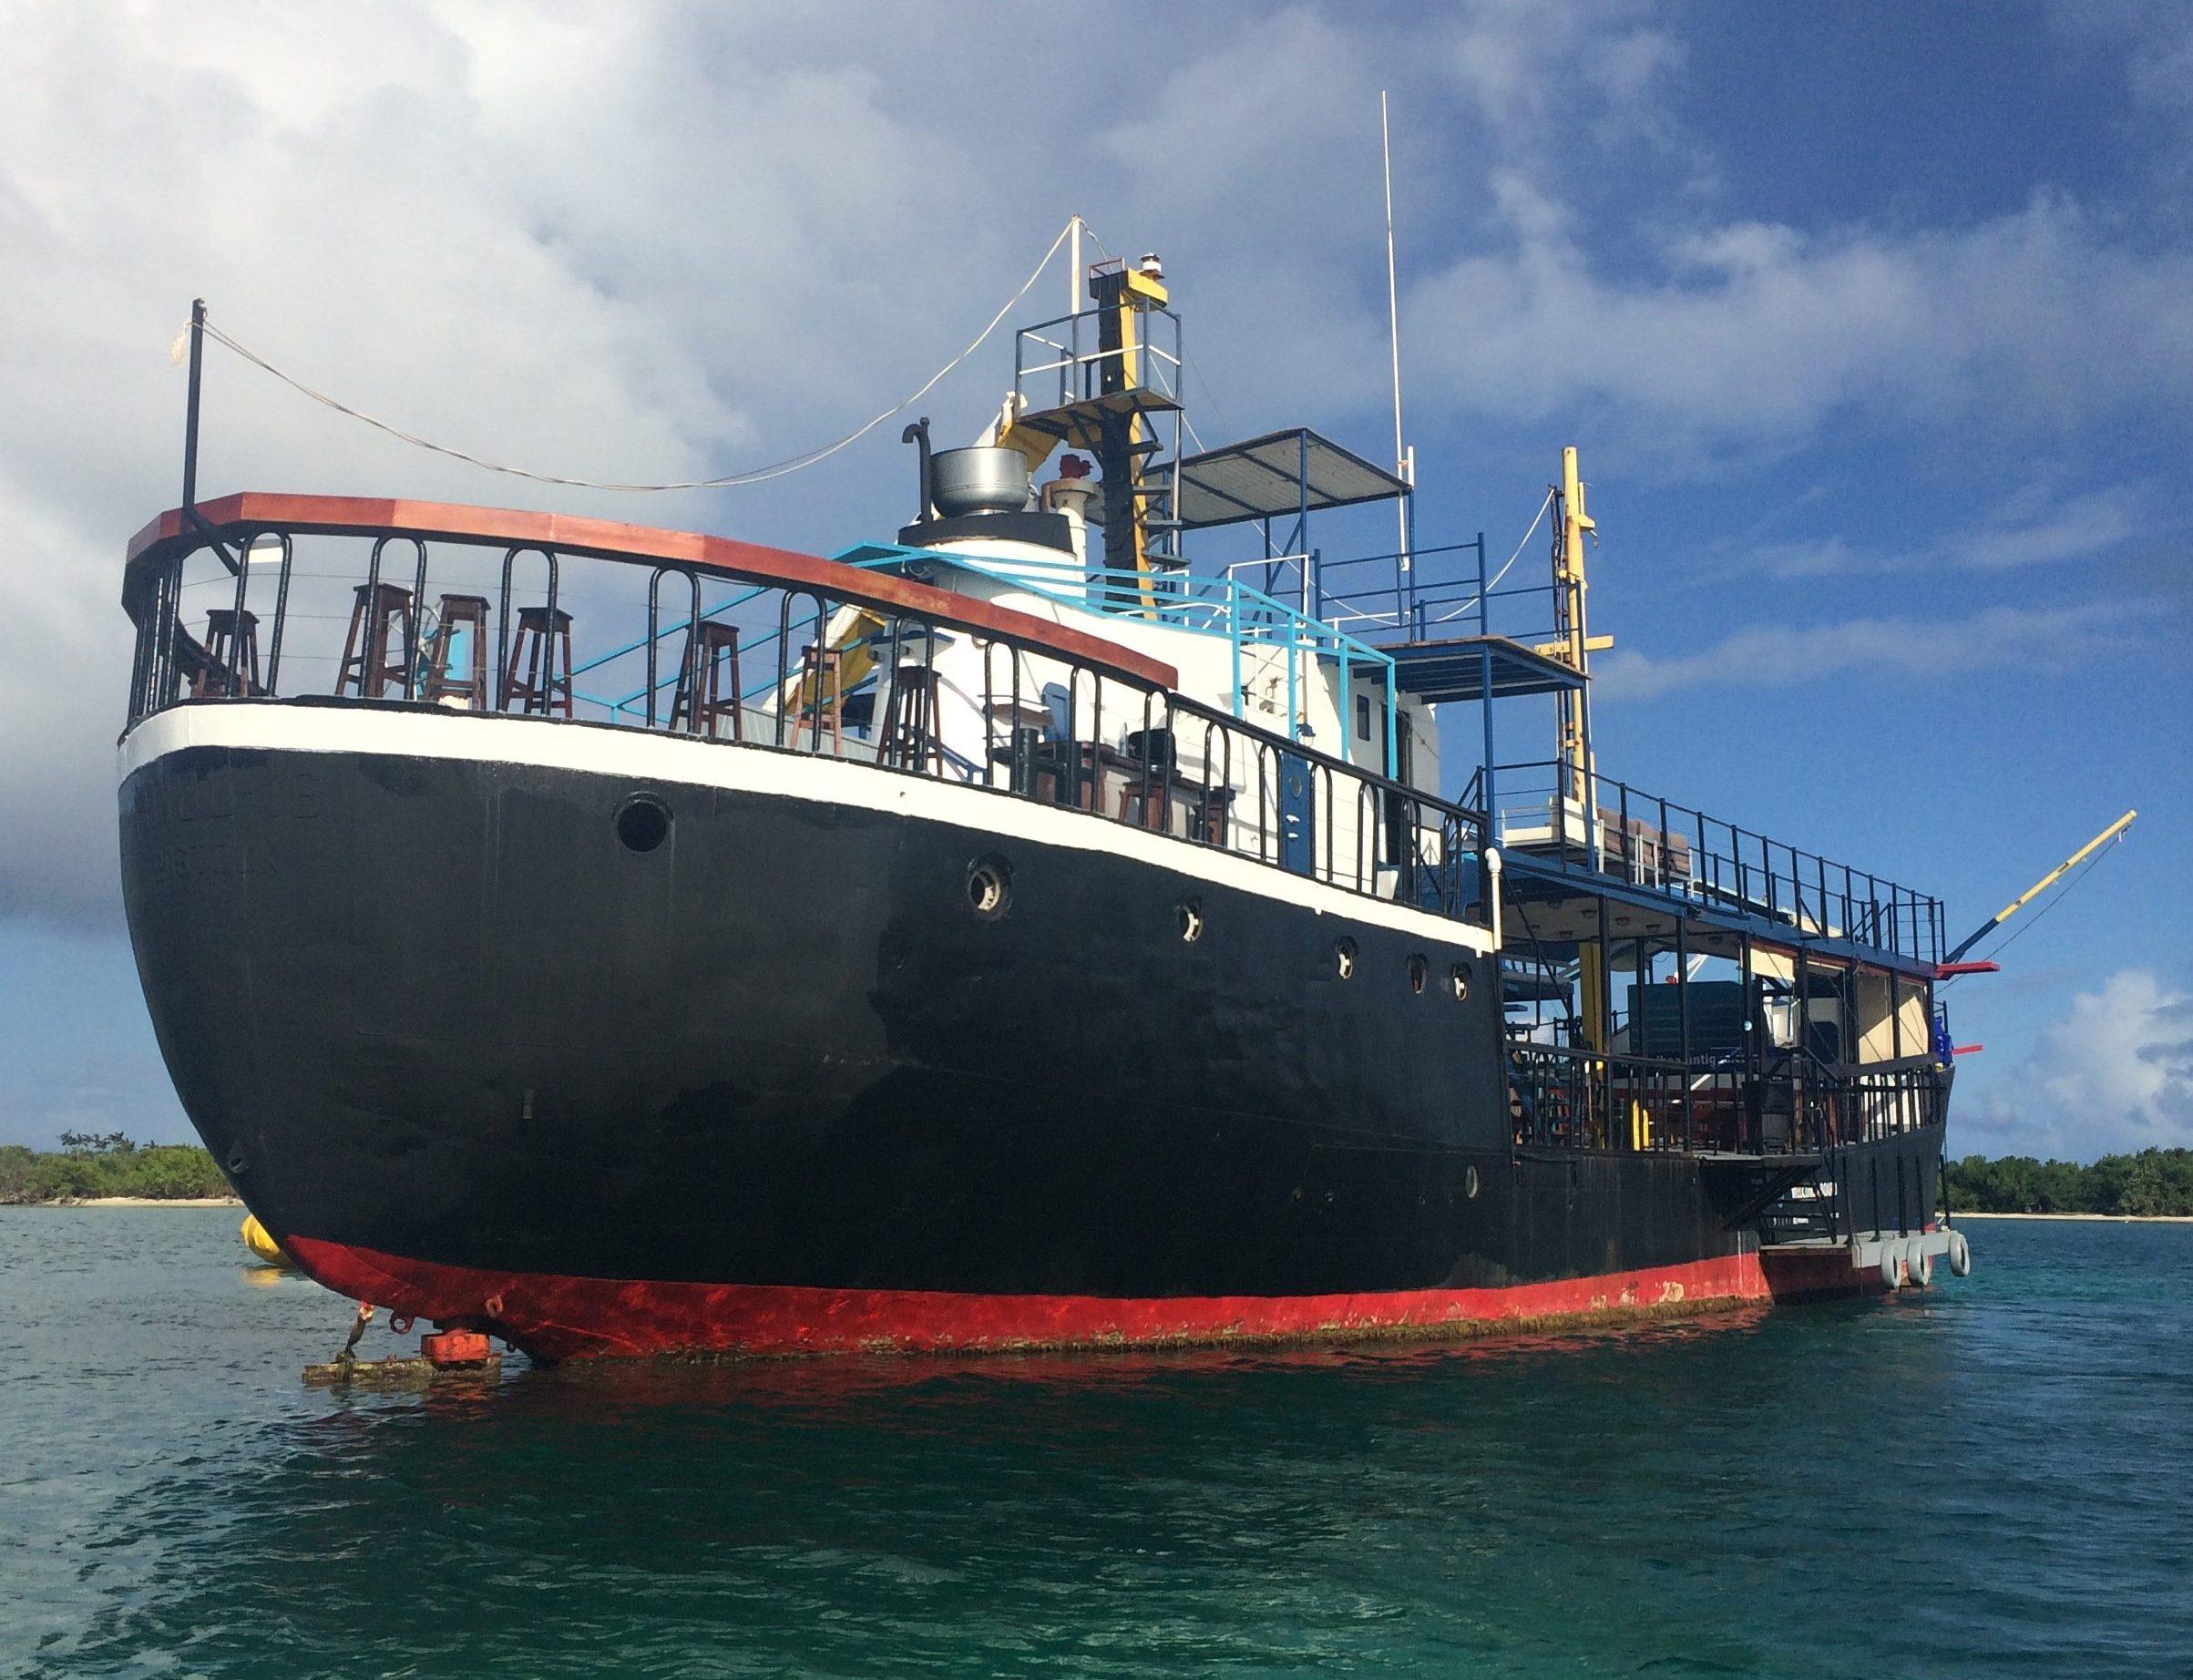 D Boat Antigua